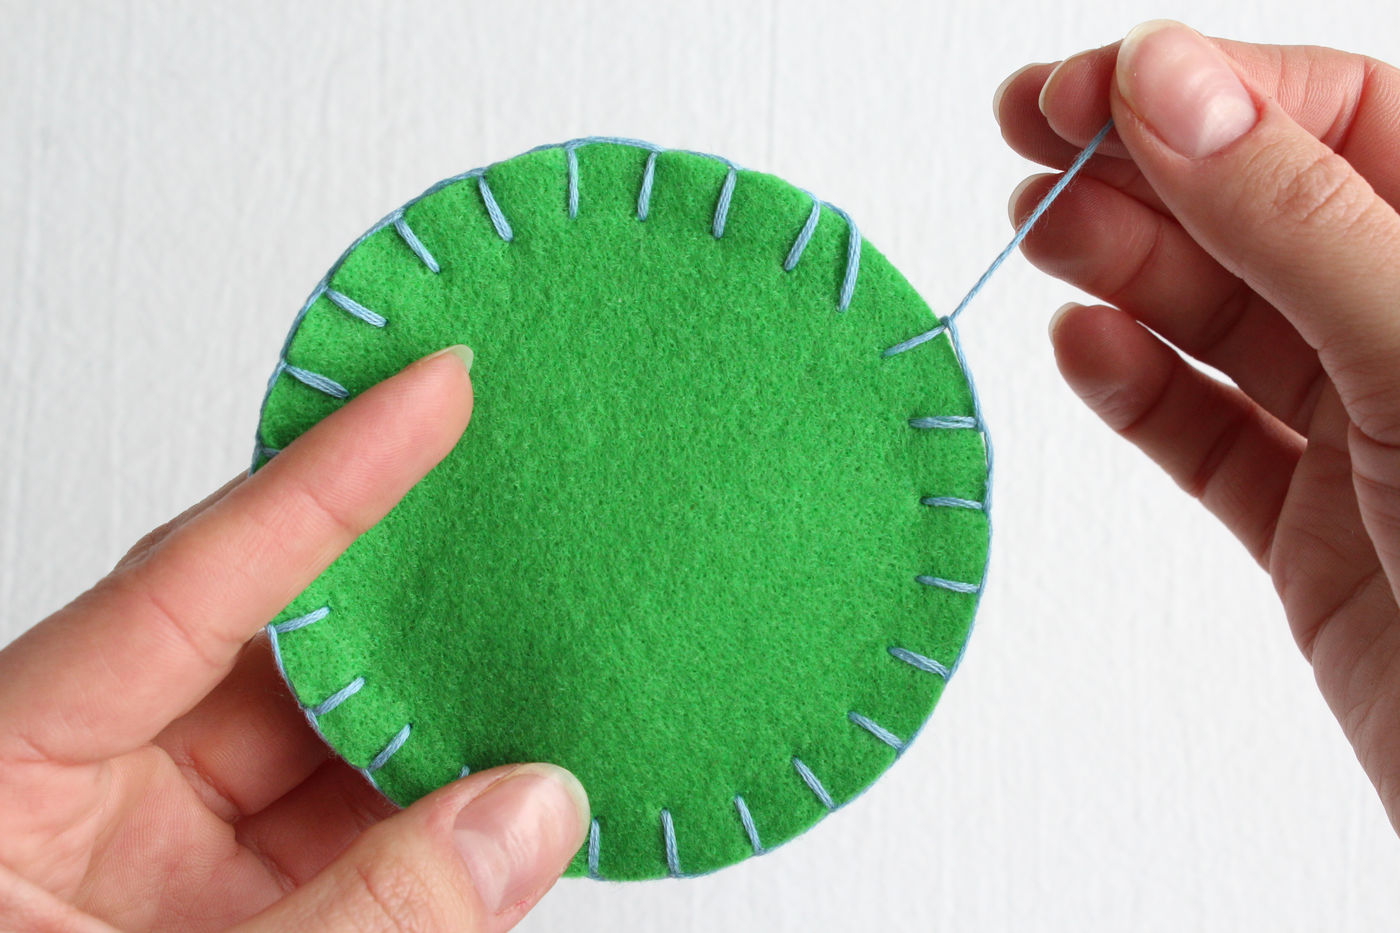 Stitching the Coasters